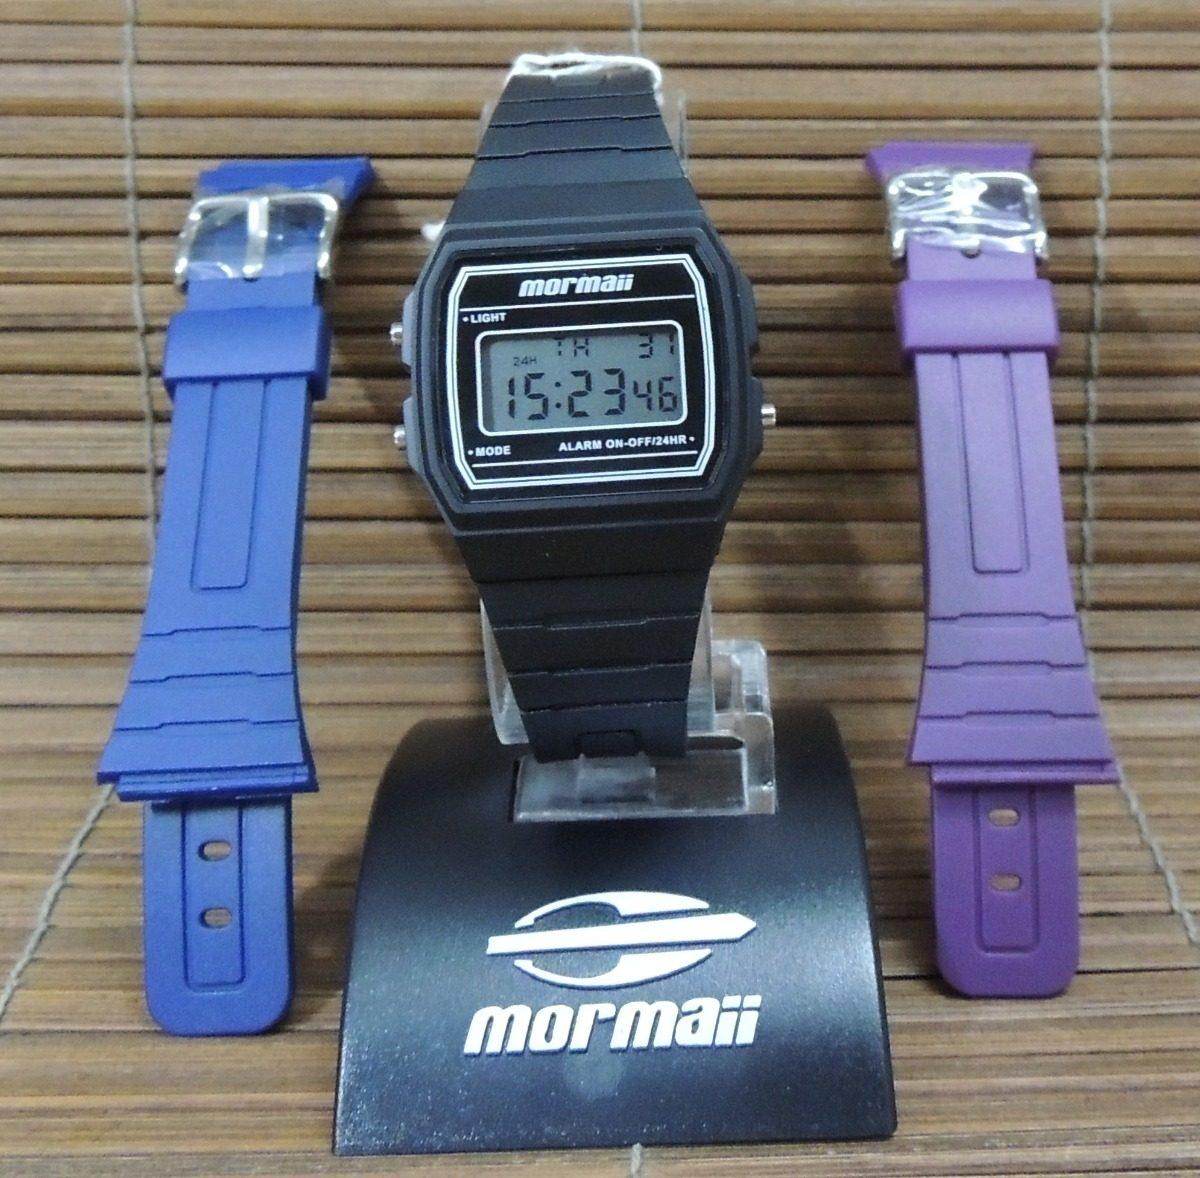 893080e82b8c2 relógio mormaii vintage troca pulseiras mojh02ah 8p - nf gar. Carregando  zoom.